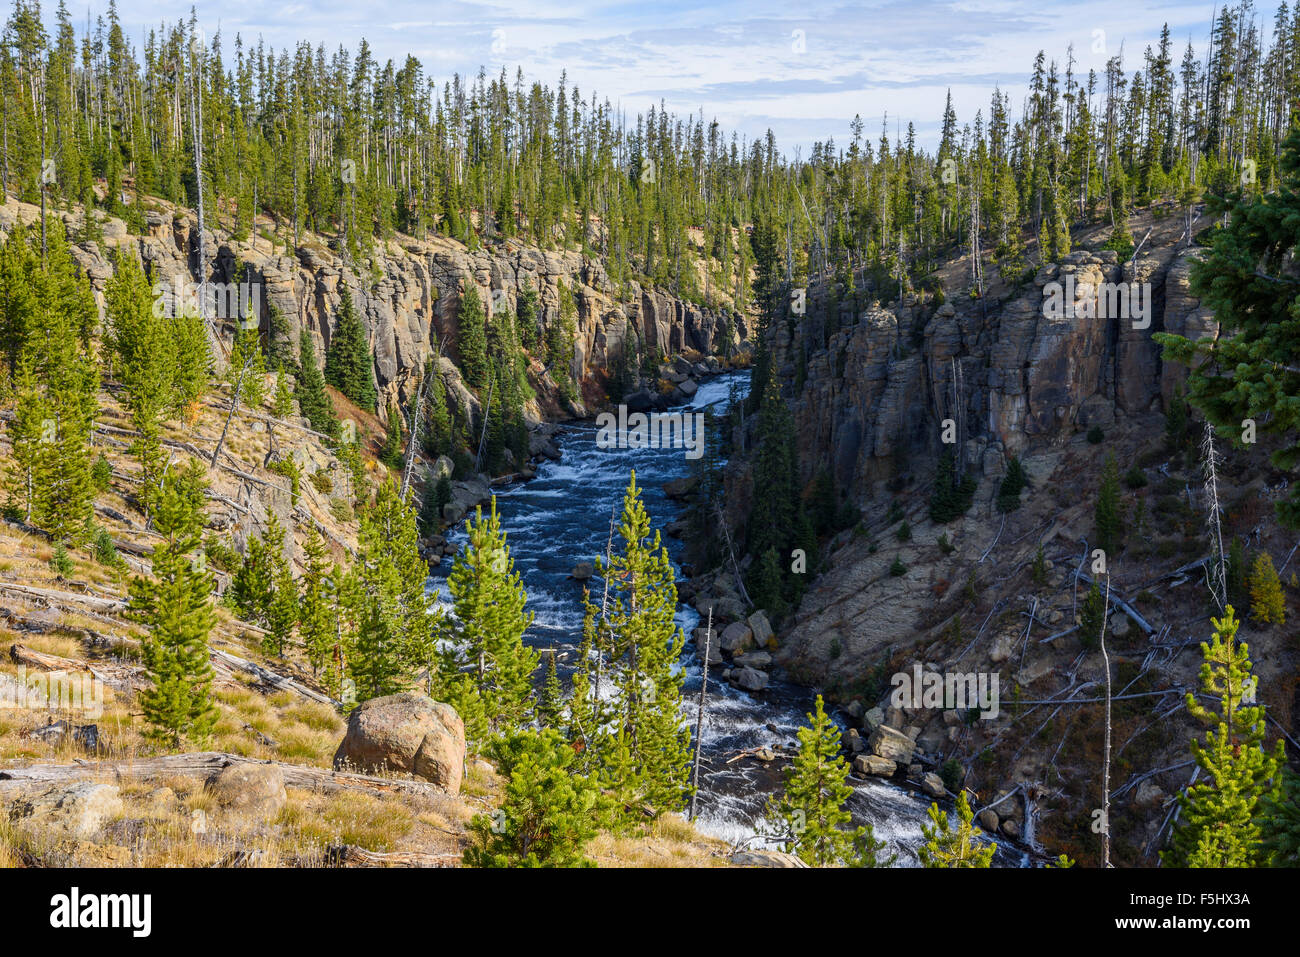 Lewis River, Yellowstone National Park, Wyoming, USA - Stock Image